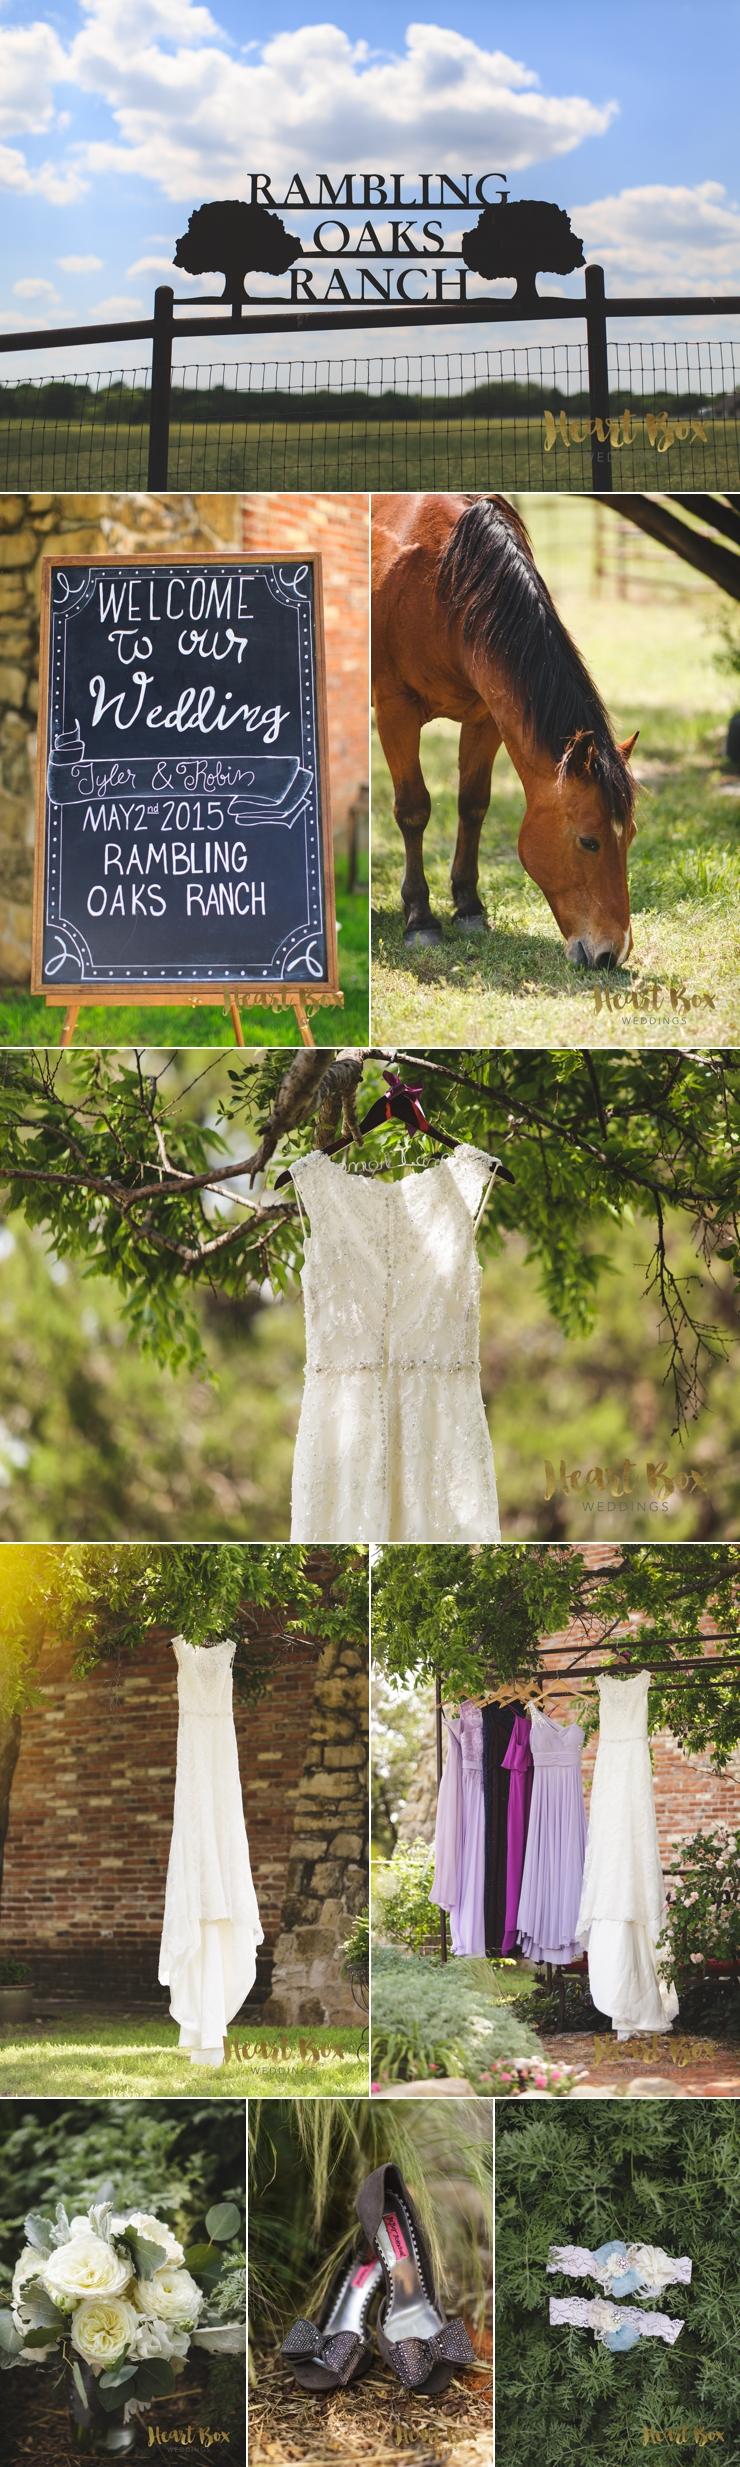 Thomas Wedding Blog Collages 1.jpg